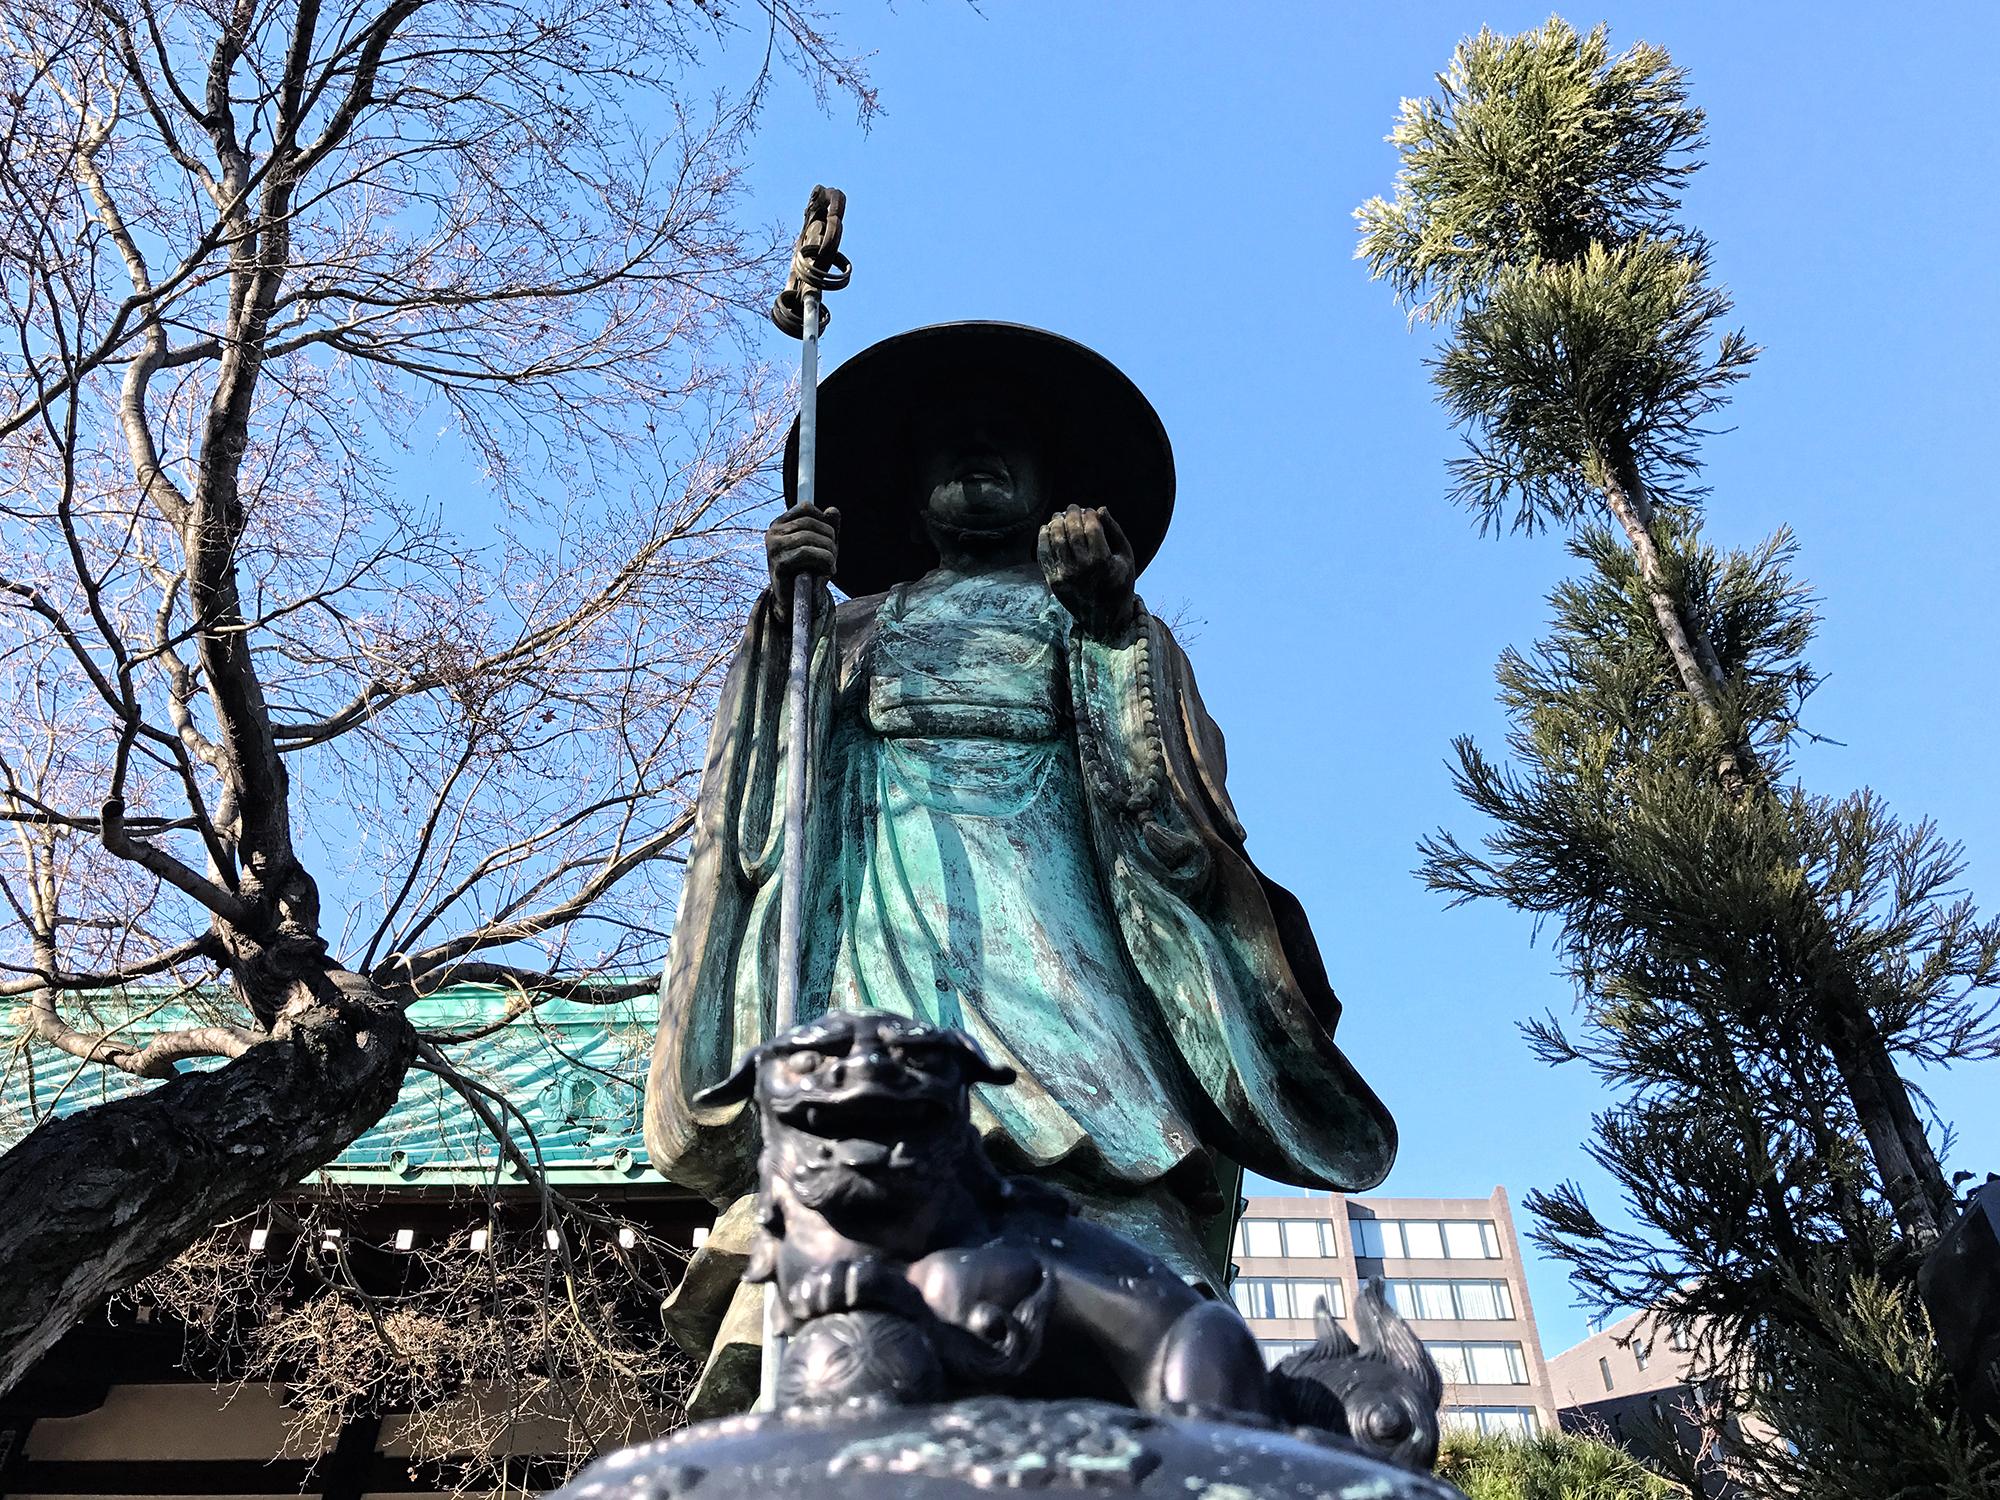 Statue of Kobo Daishi (弘法大師修行像,  koubou daishi shugyou zou , high monk of ascetic practices statue), (posthumous title of Kuukai) as a Wandering Ascetic.